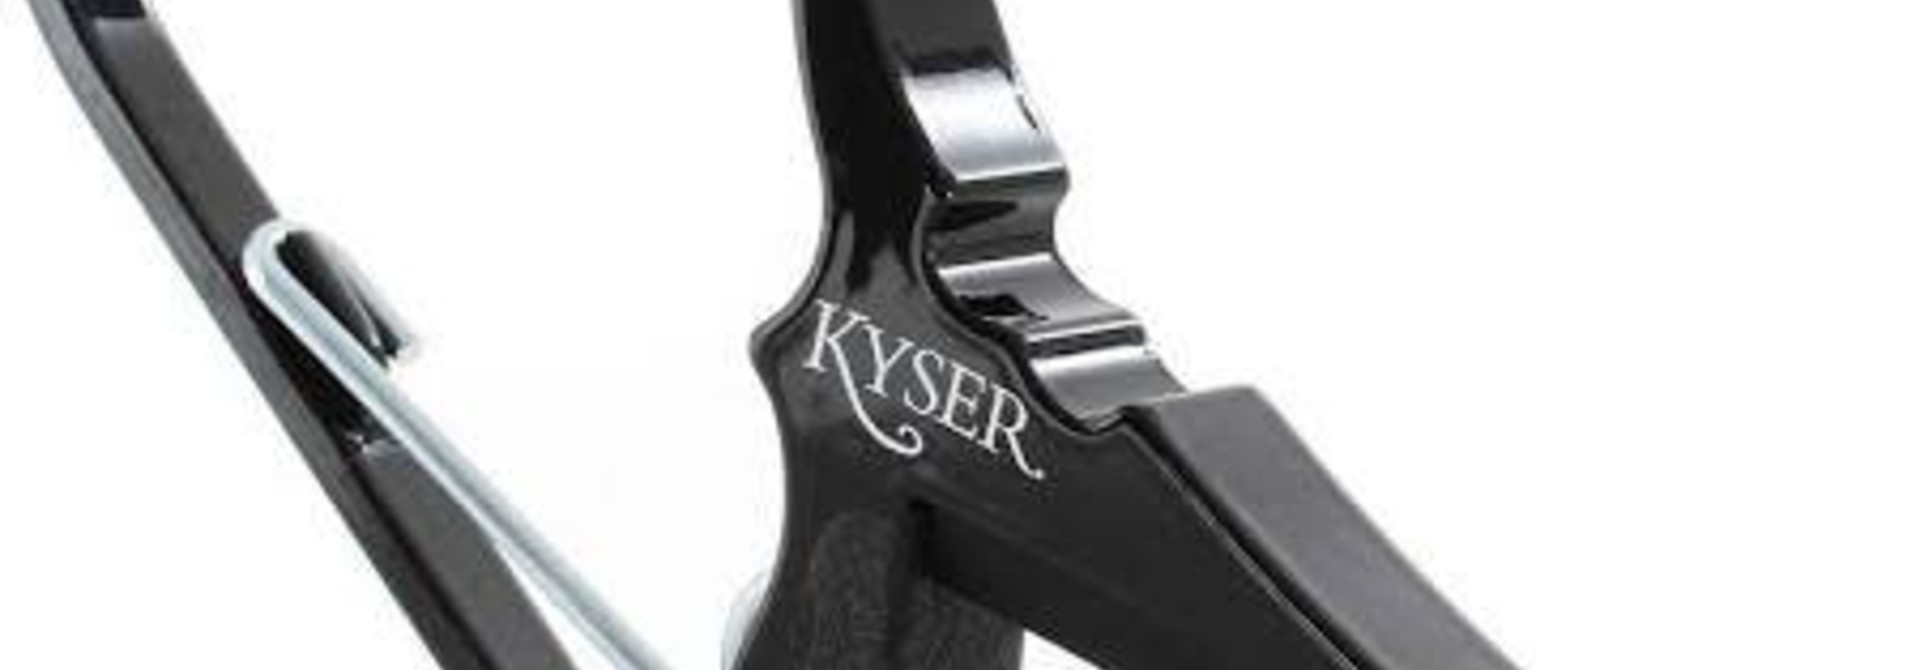 Kyser Capo Black